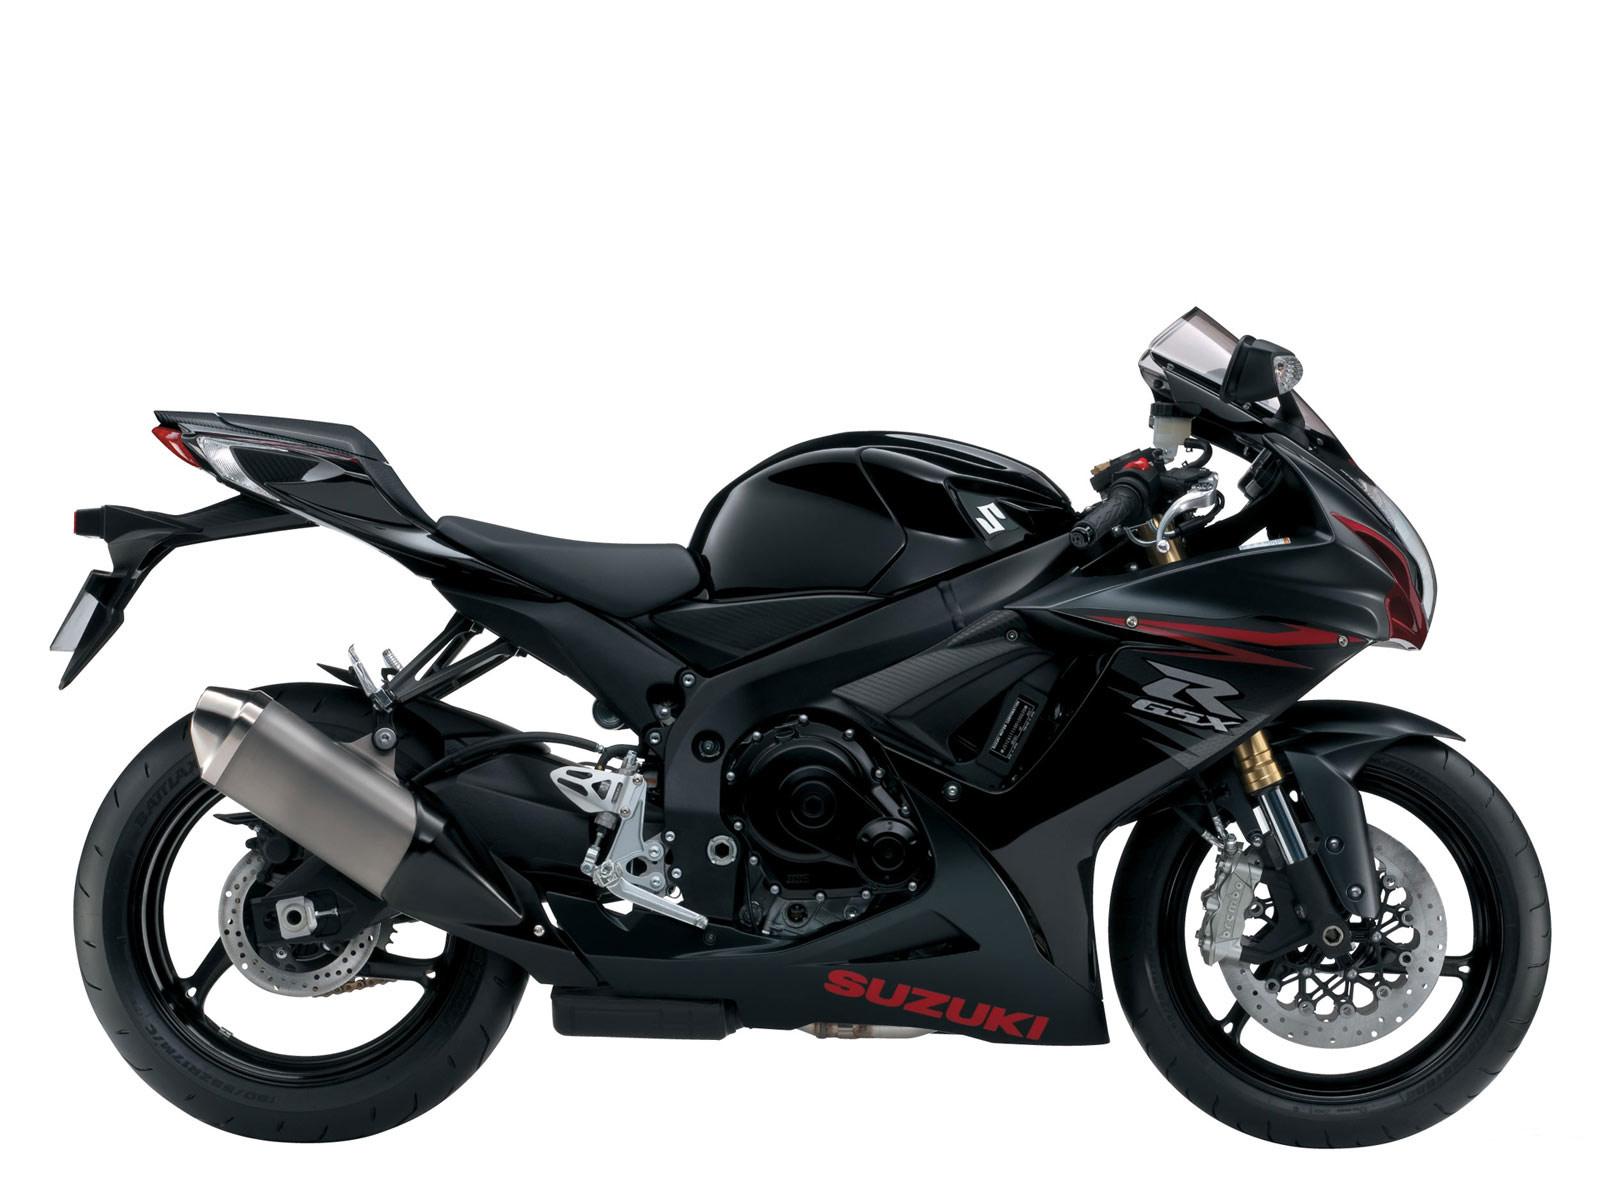 http://2.bp.blogspot.com/-Pe4Ve4pWn7s/TuVPTGIAZ9I/AAAAAAAAFNI/cNWgYQxNlhk/s1600/2011_Suzuki_GSX-R_750_motorcycle-desktop-wallpaper_08.jpg